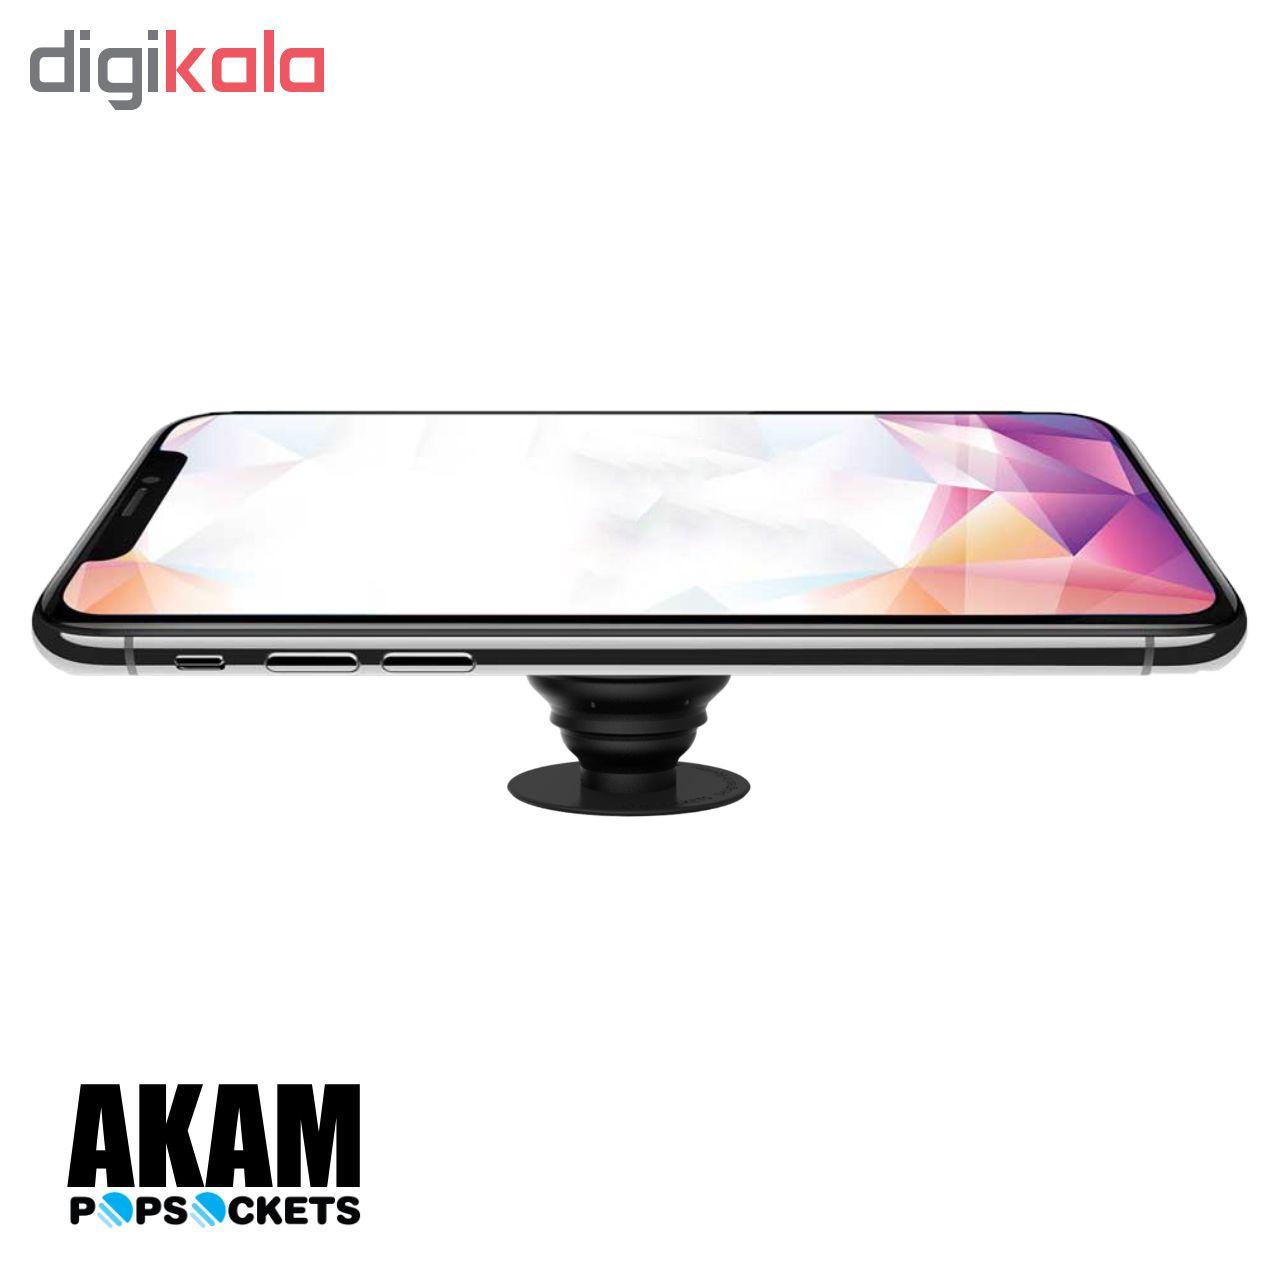 پایه نگهدارنده گوشی موبایل پاپ سوکت آکام مدل APS0111 main 1 10